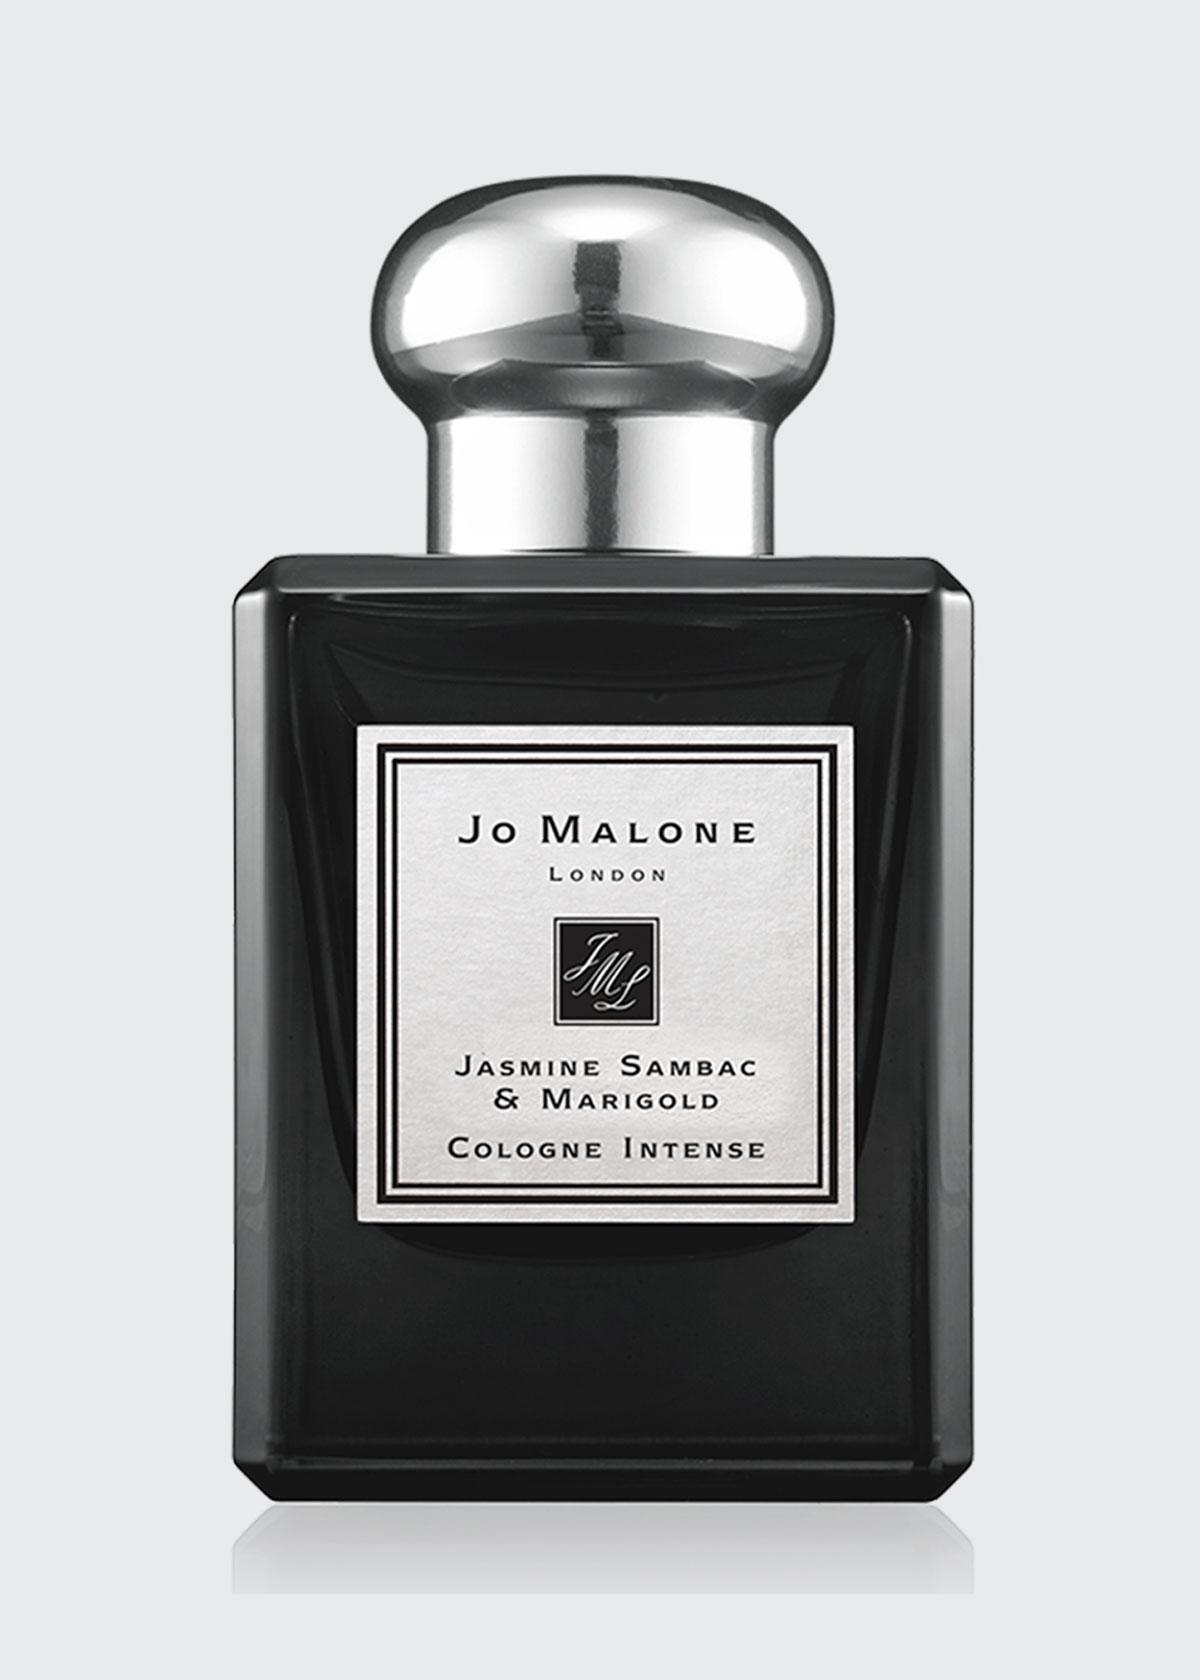 Jo Malone London JASMINE SAMBAC & MARIGOLD COLOGNE, 1.7 OZ./ 50 ML